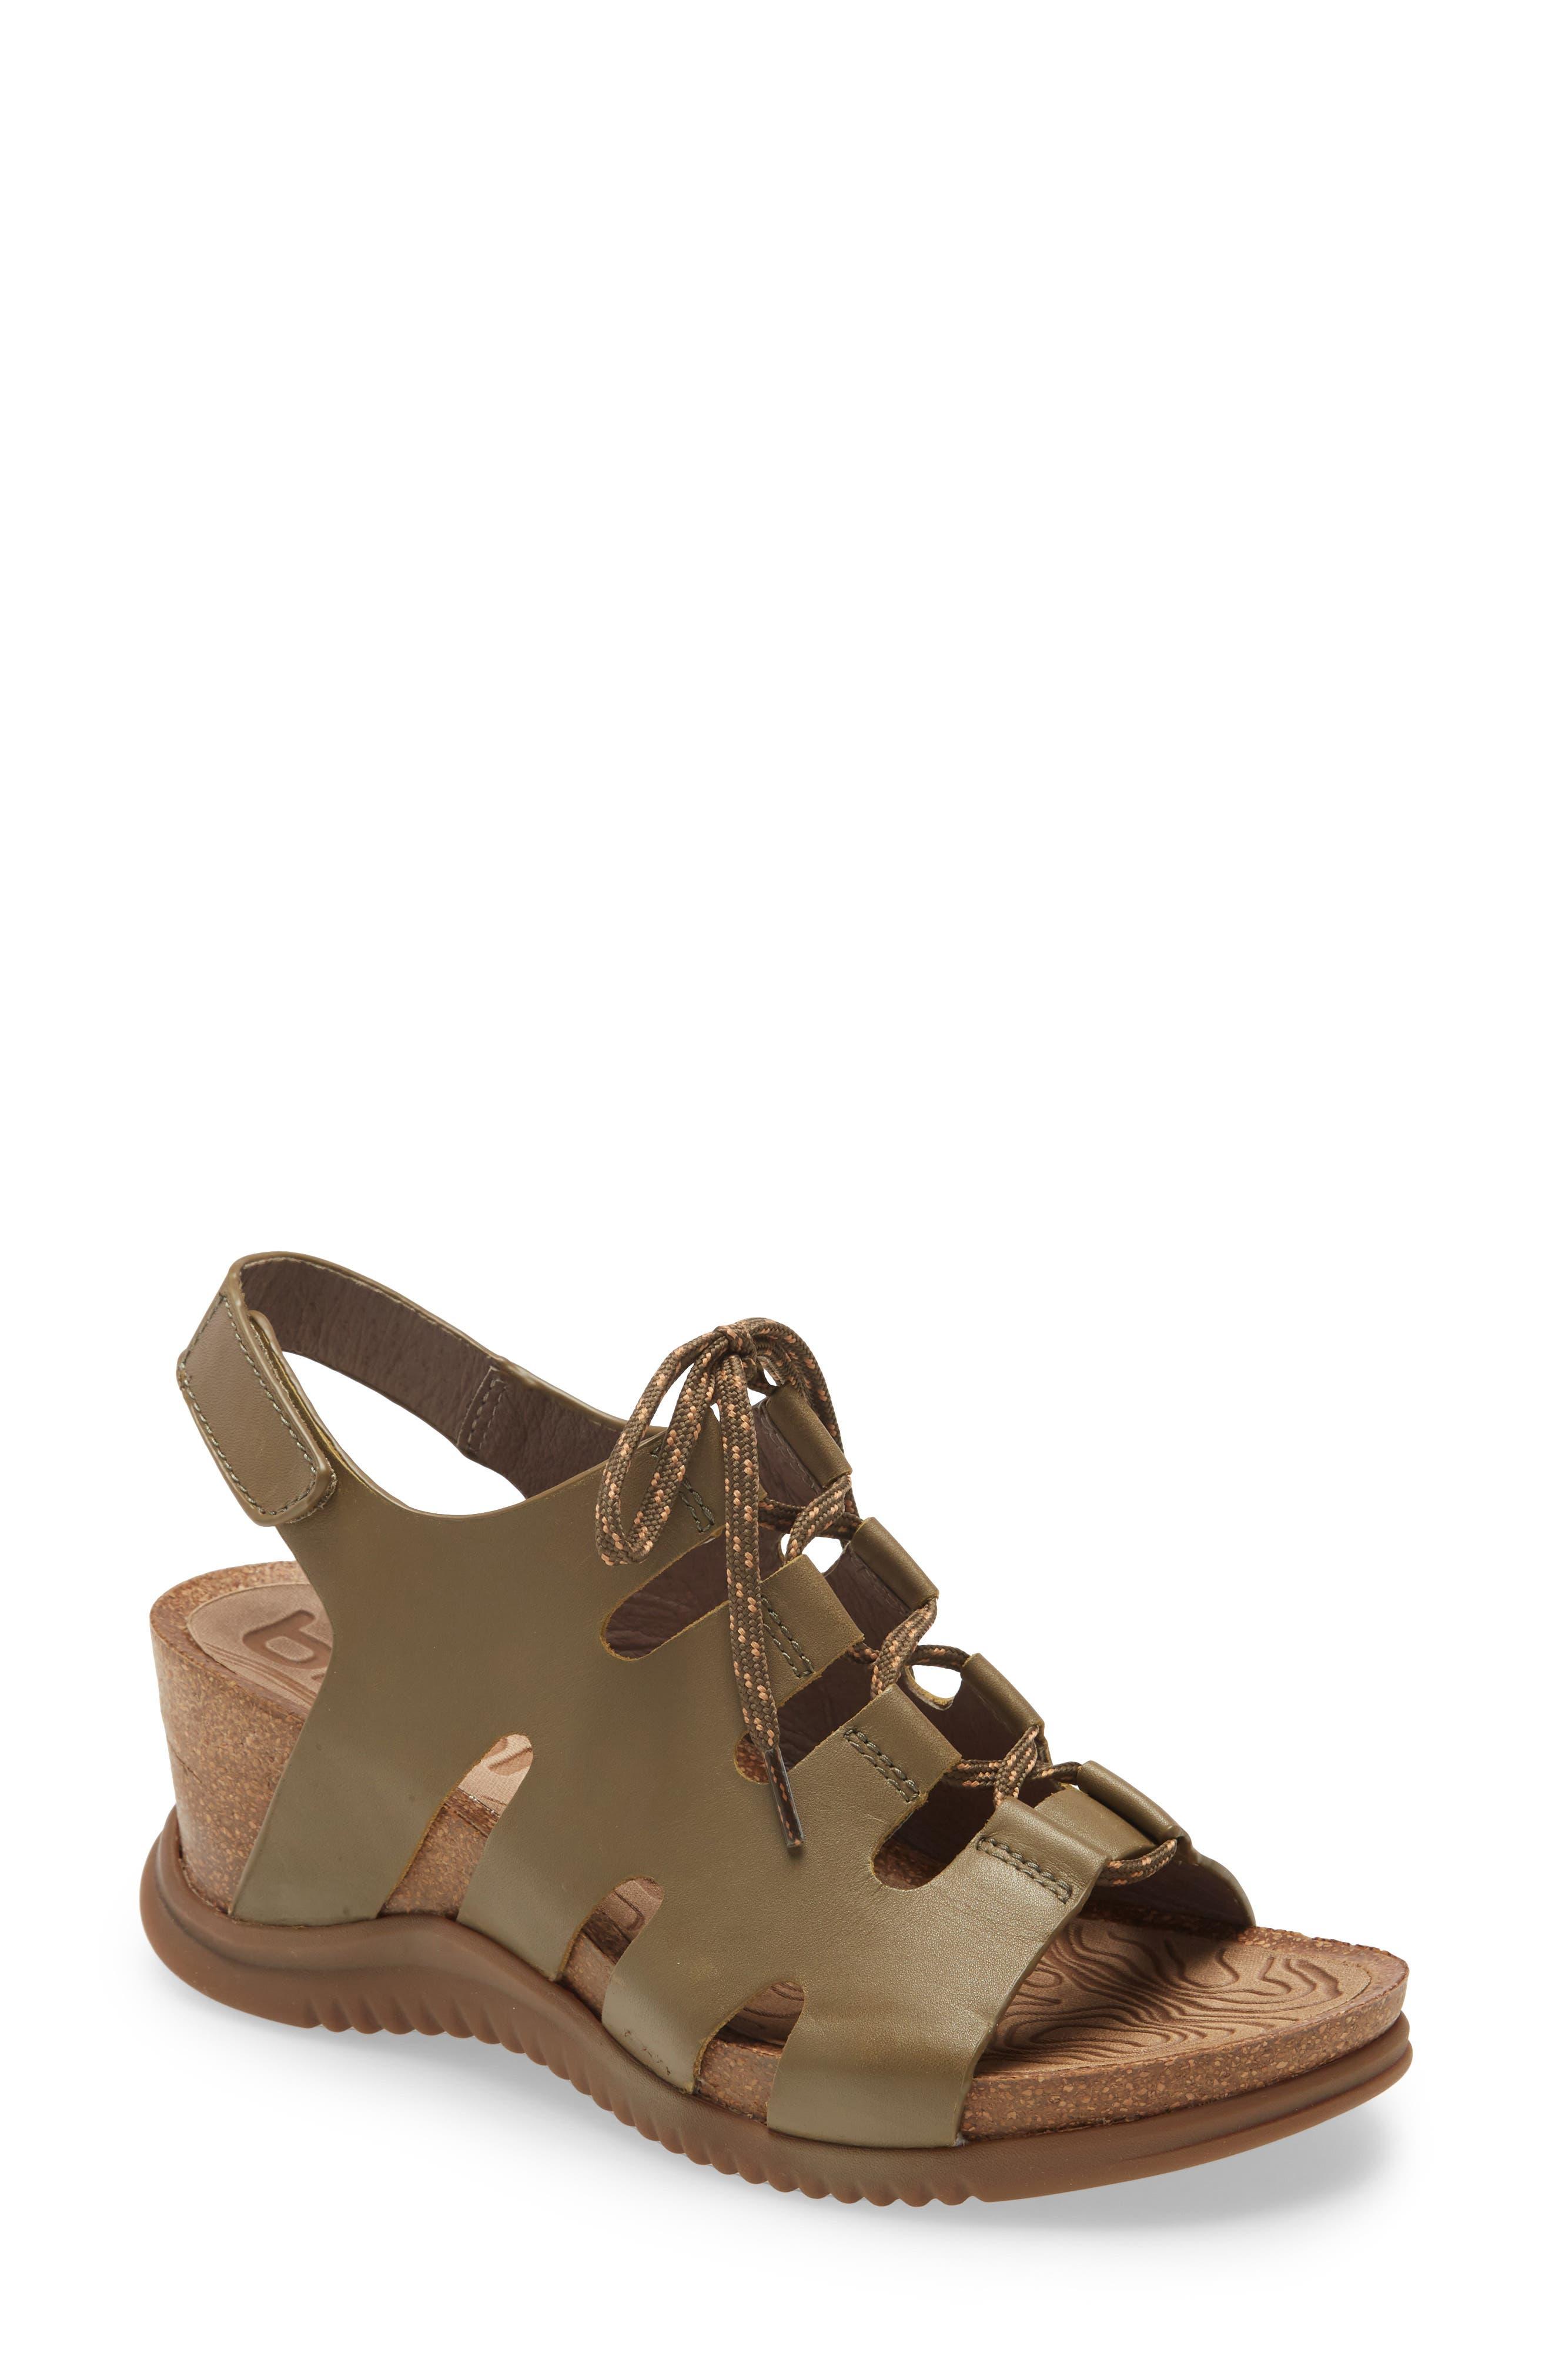 Women's Bionica Sorena Ghillie Wedge Sandal, Size 7 M - Green